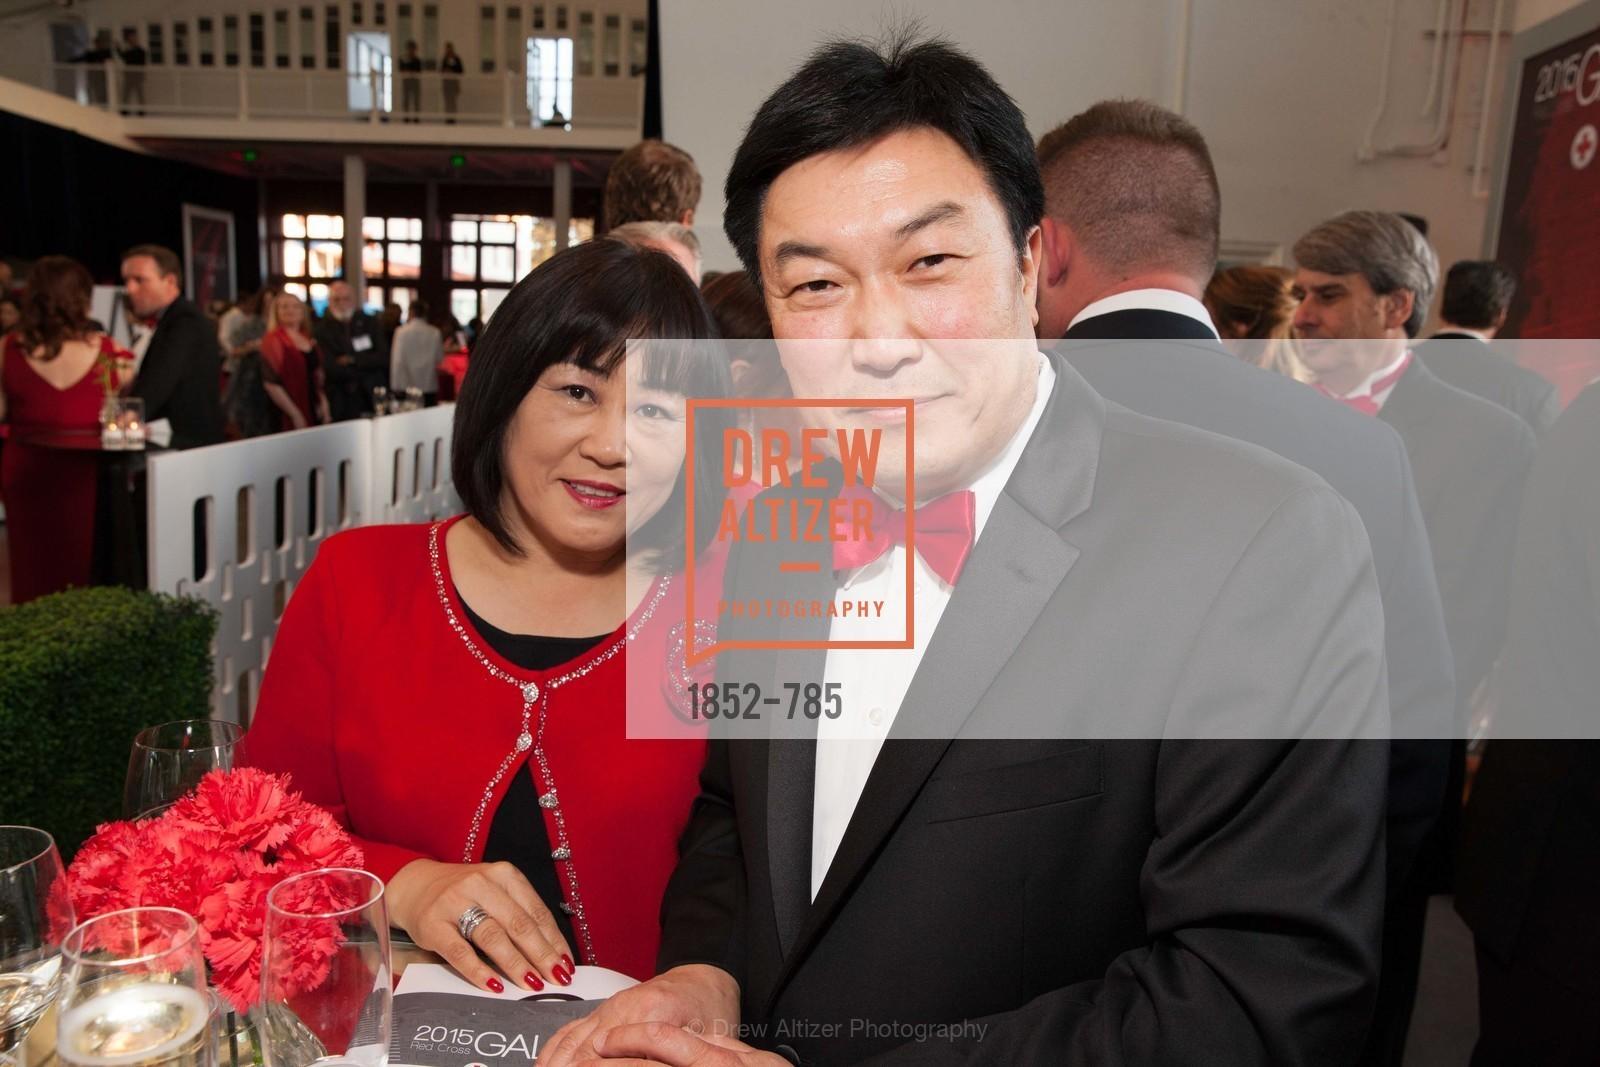 Jae Shin, Gun Shin, 2015 RED CROSS Gala, US, April 11th, 2015,Drew Altizer, Drew Altizer Photography, full-service agency, private events, San Francisco photographer, photographer california